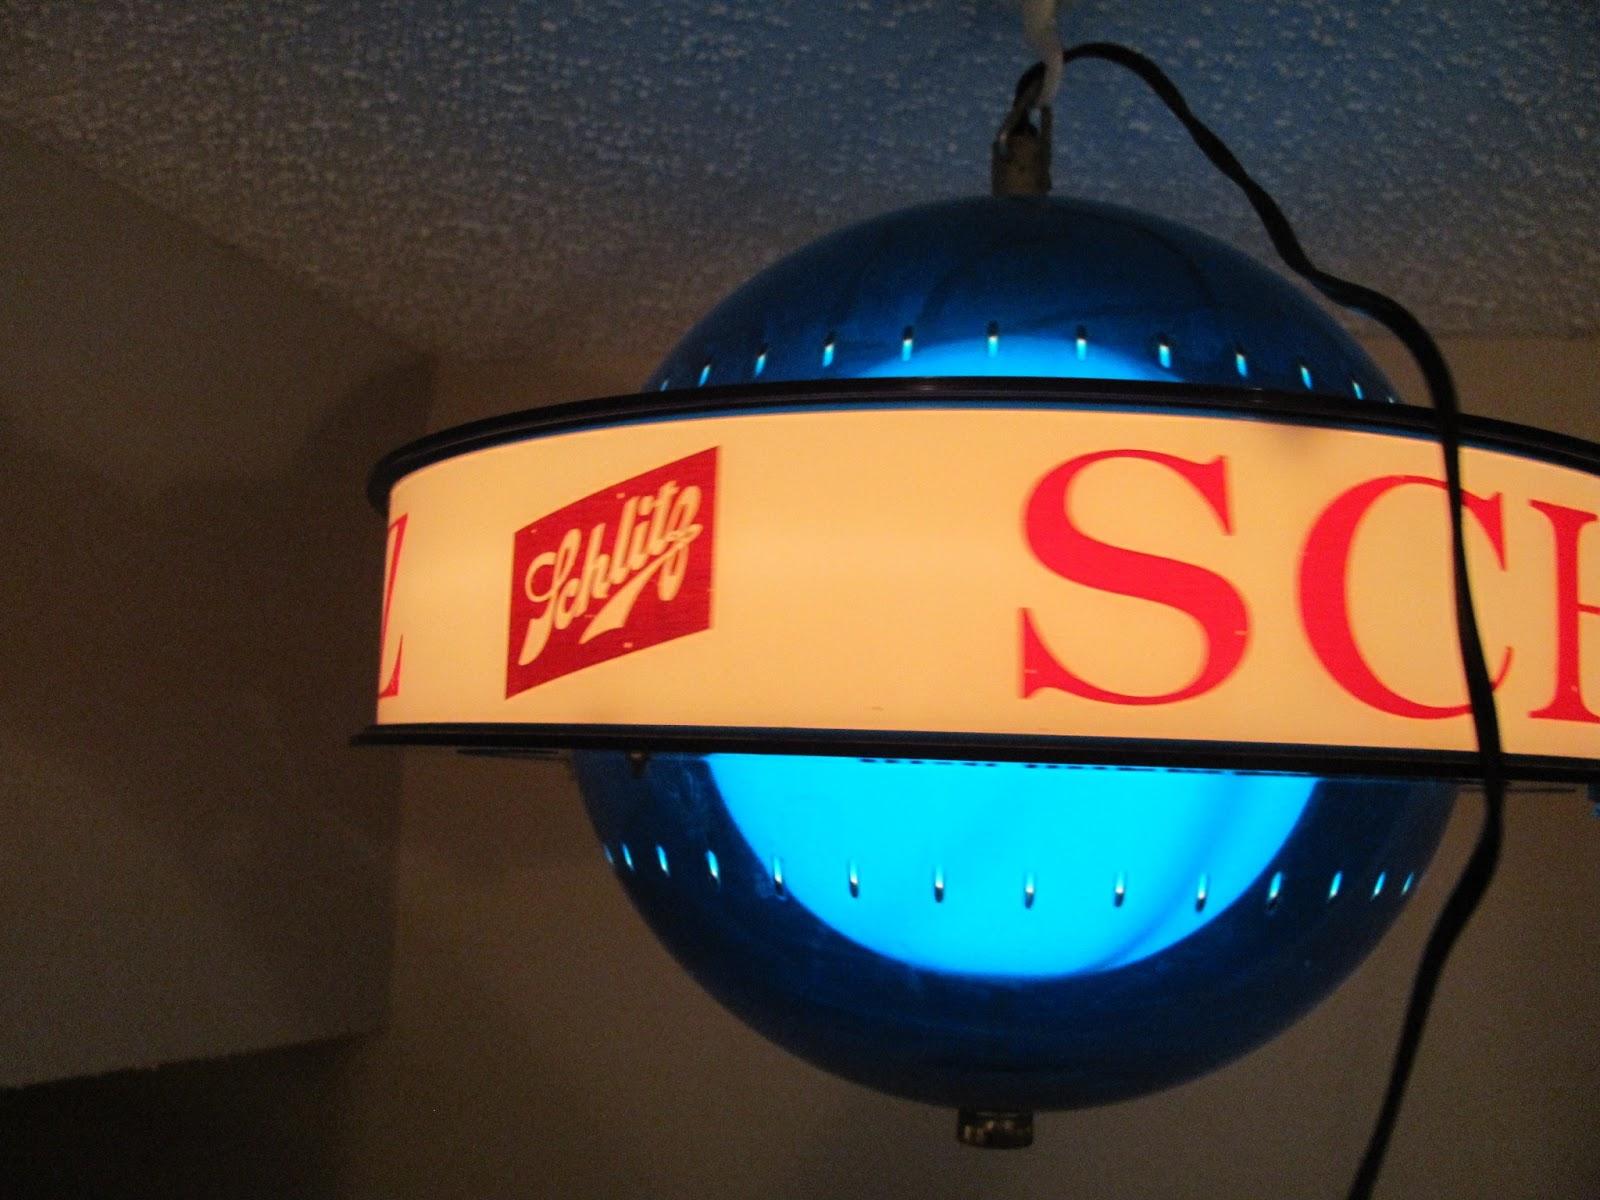 Blue Schlitz spinning globe light in action in a dark room